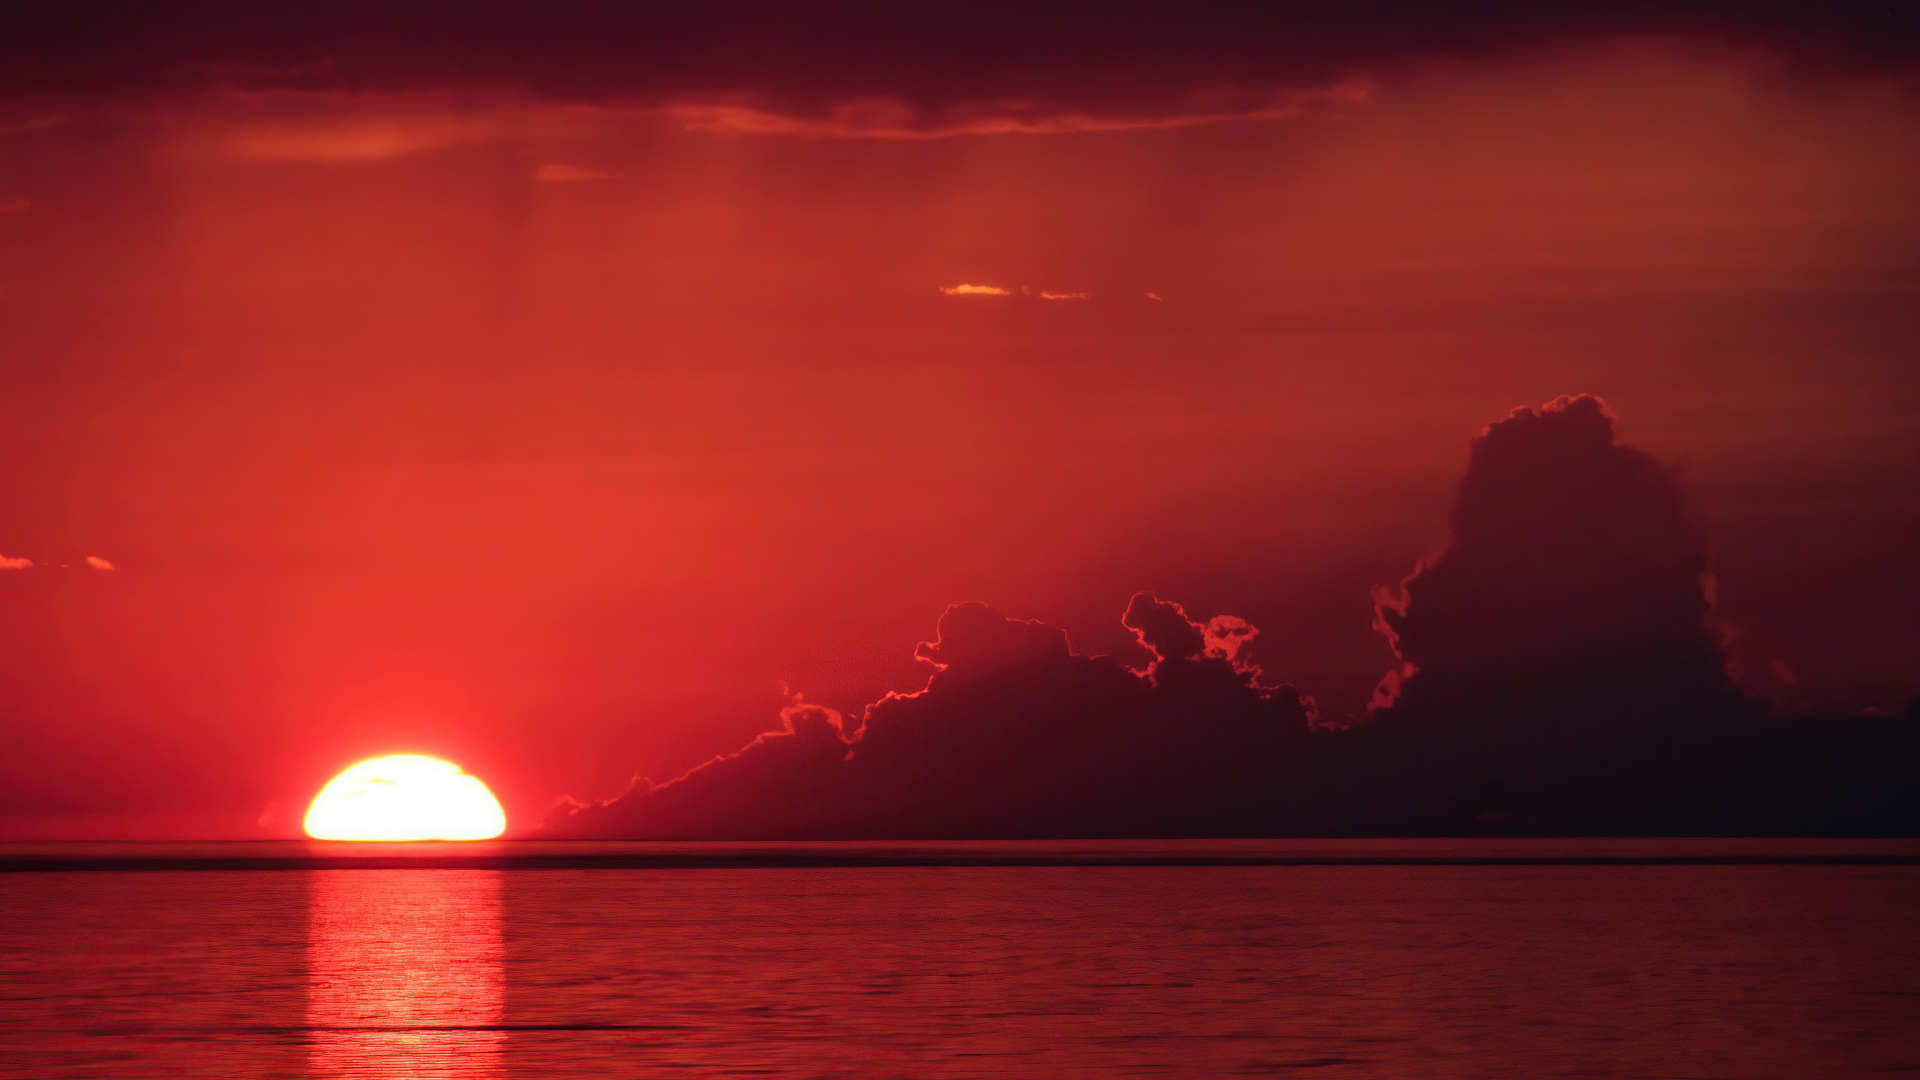 sun-setting-on-lake-ontario-56.jpg